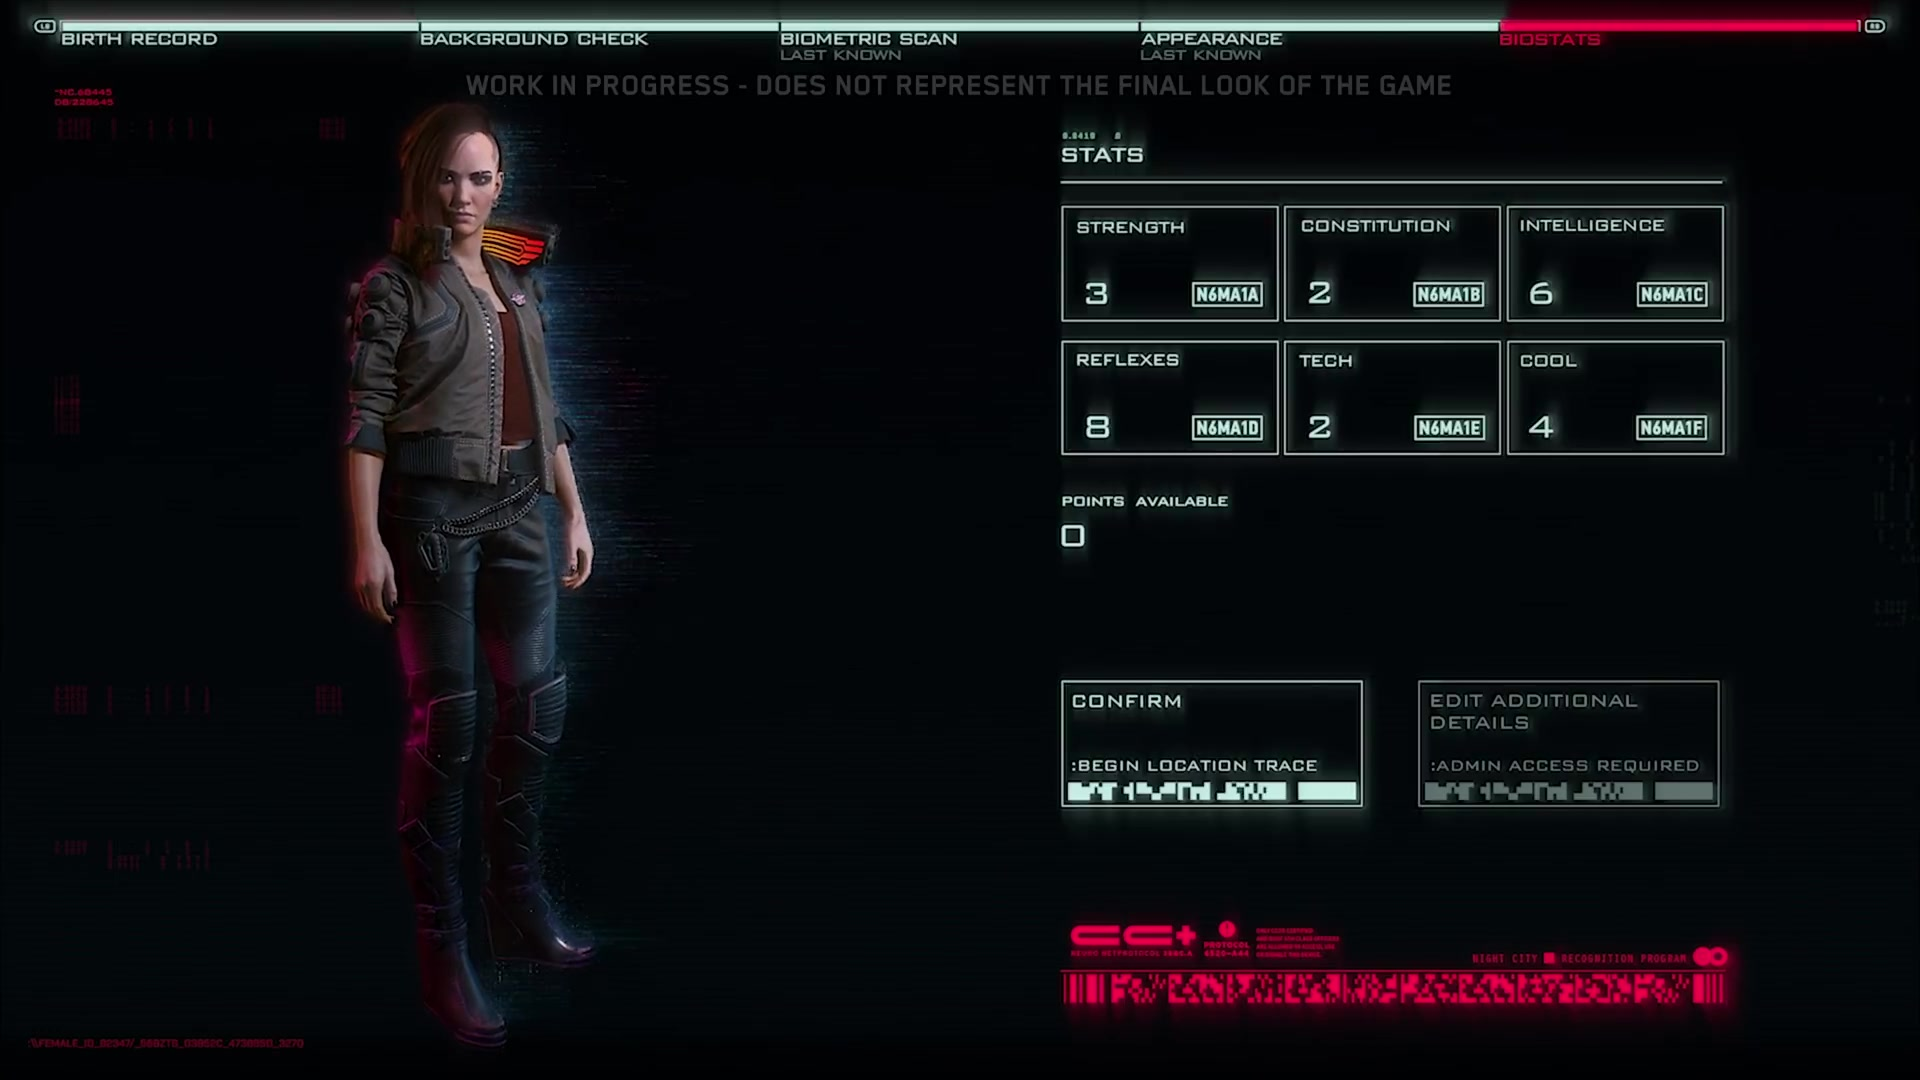 Cyberpunk 2020: игра, на которой основан Cyberpunk 2077 5